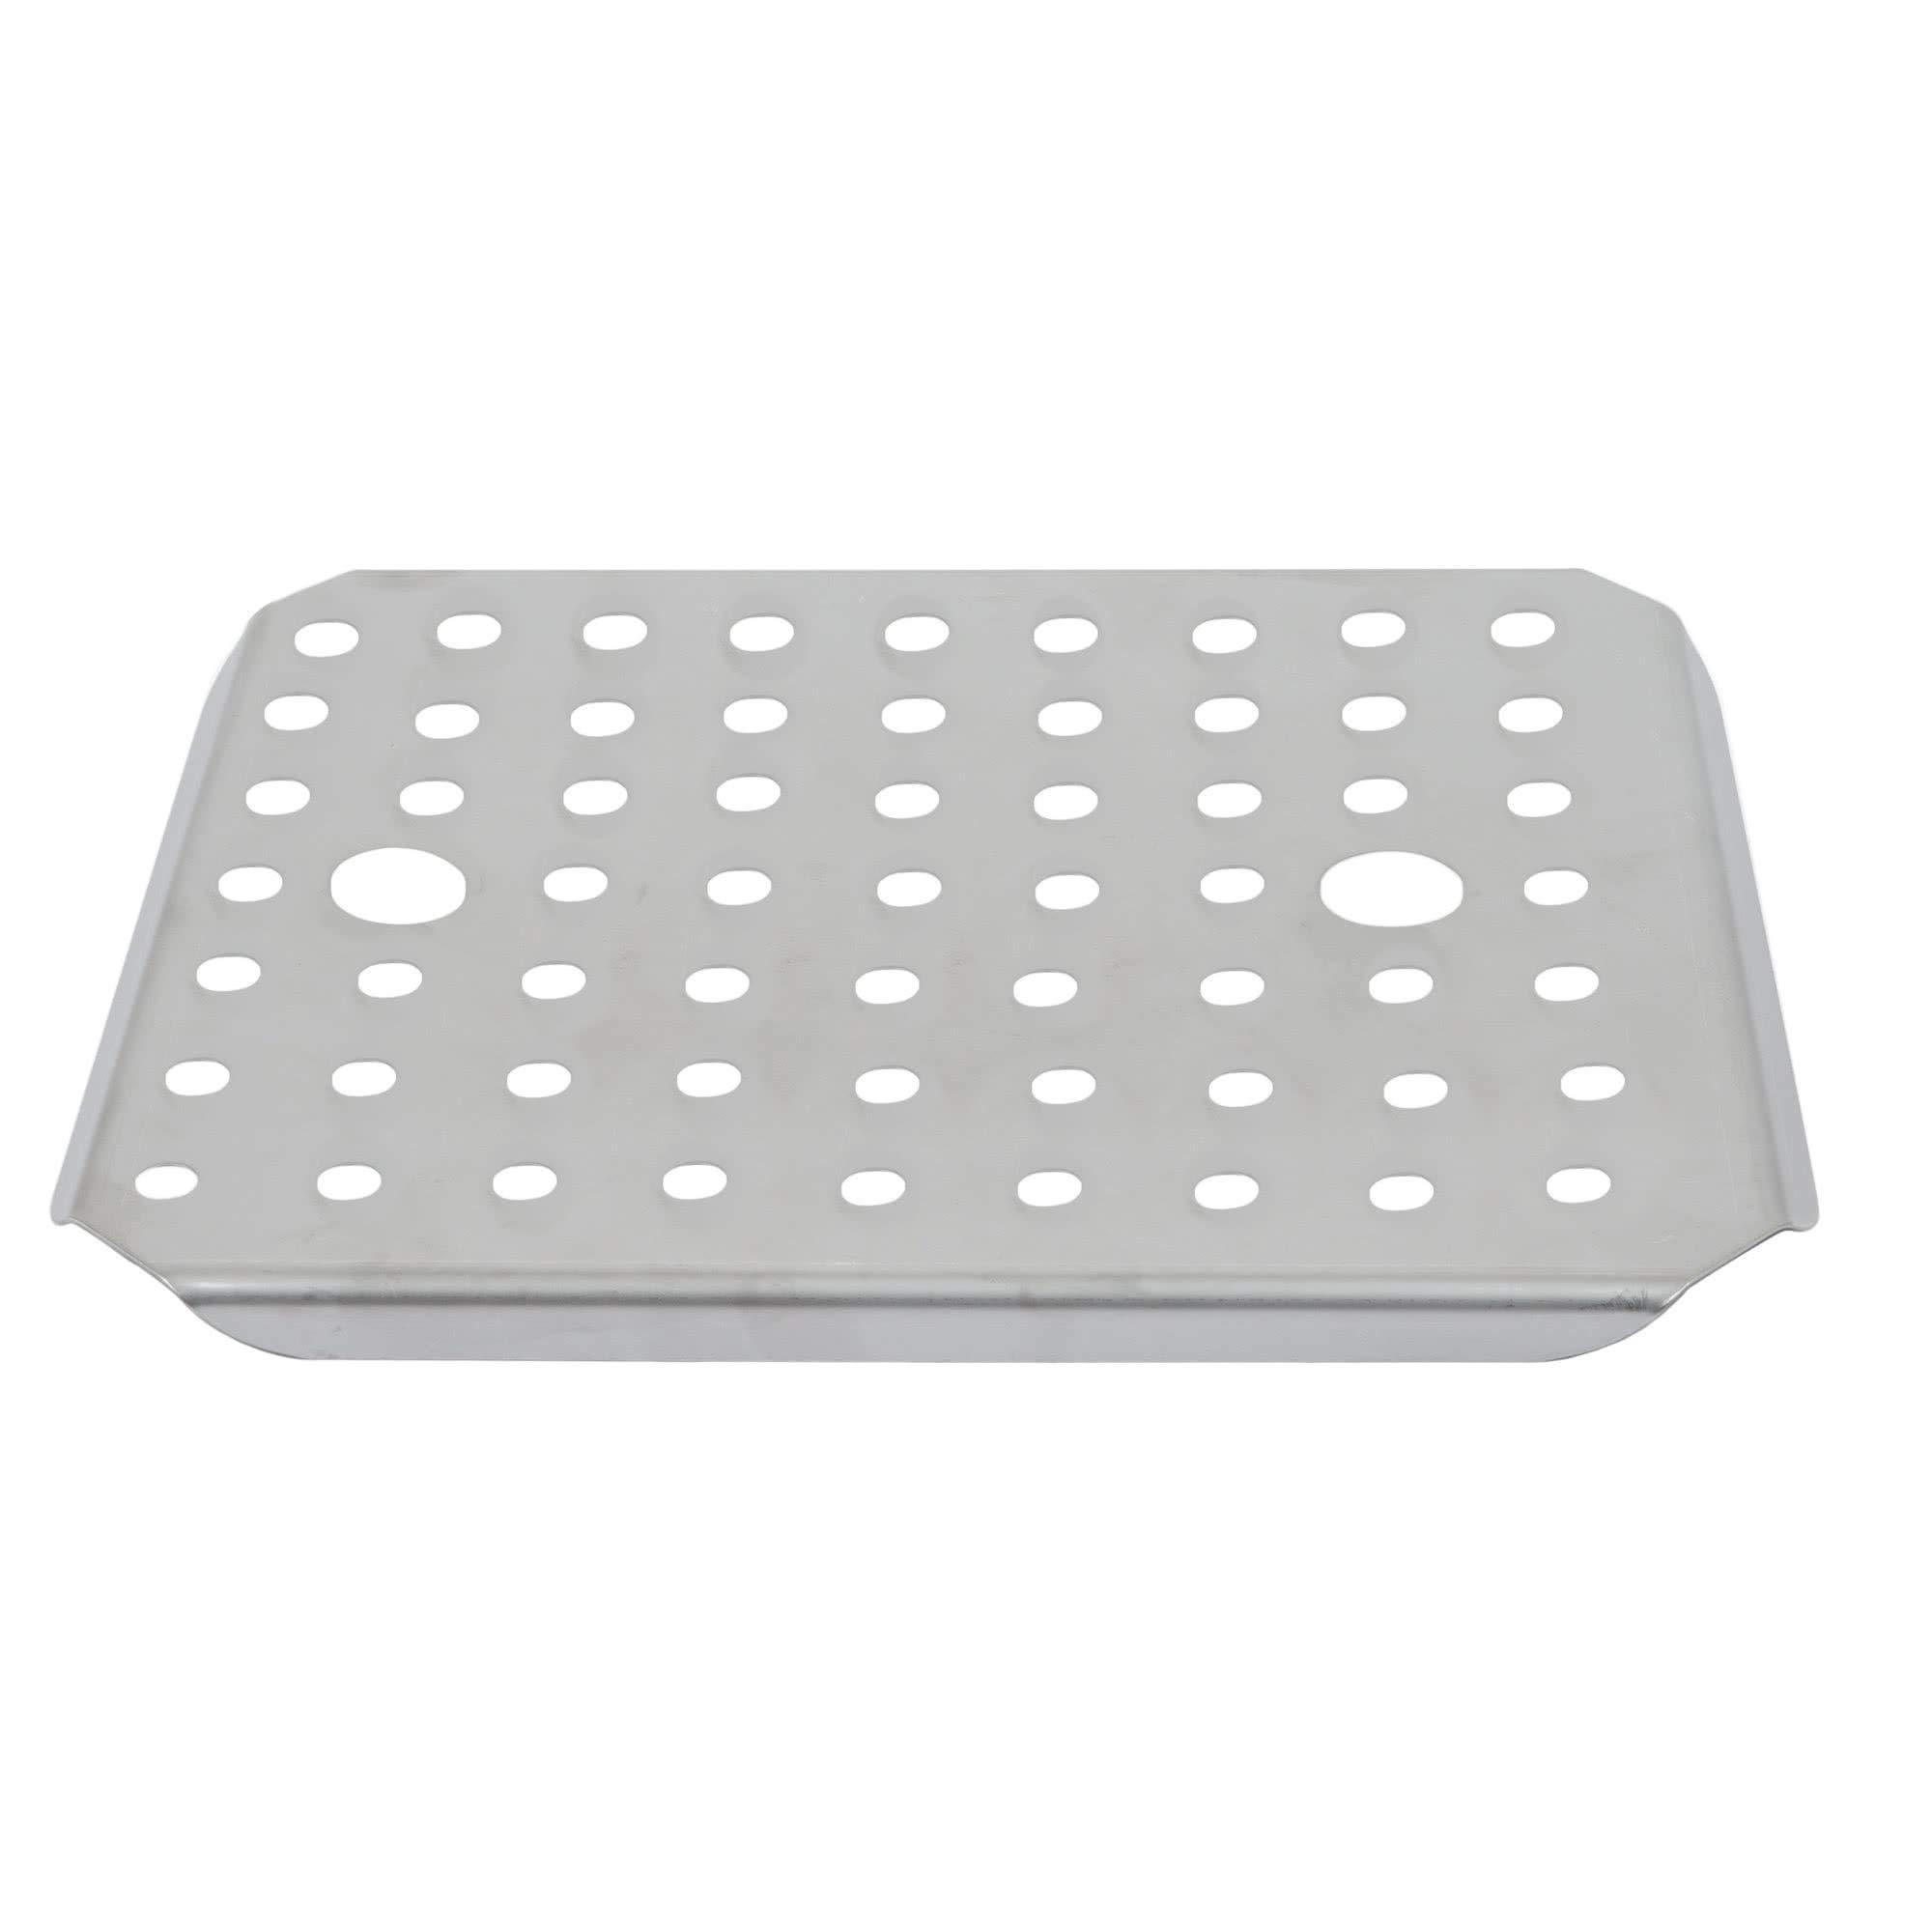 TableTop King 21110 Super Pan V 2/3 Size Stainless Steel Steam Table/Hotel Pan False Bottom